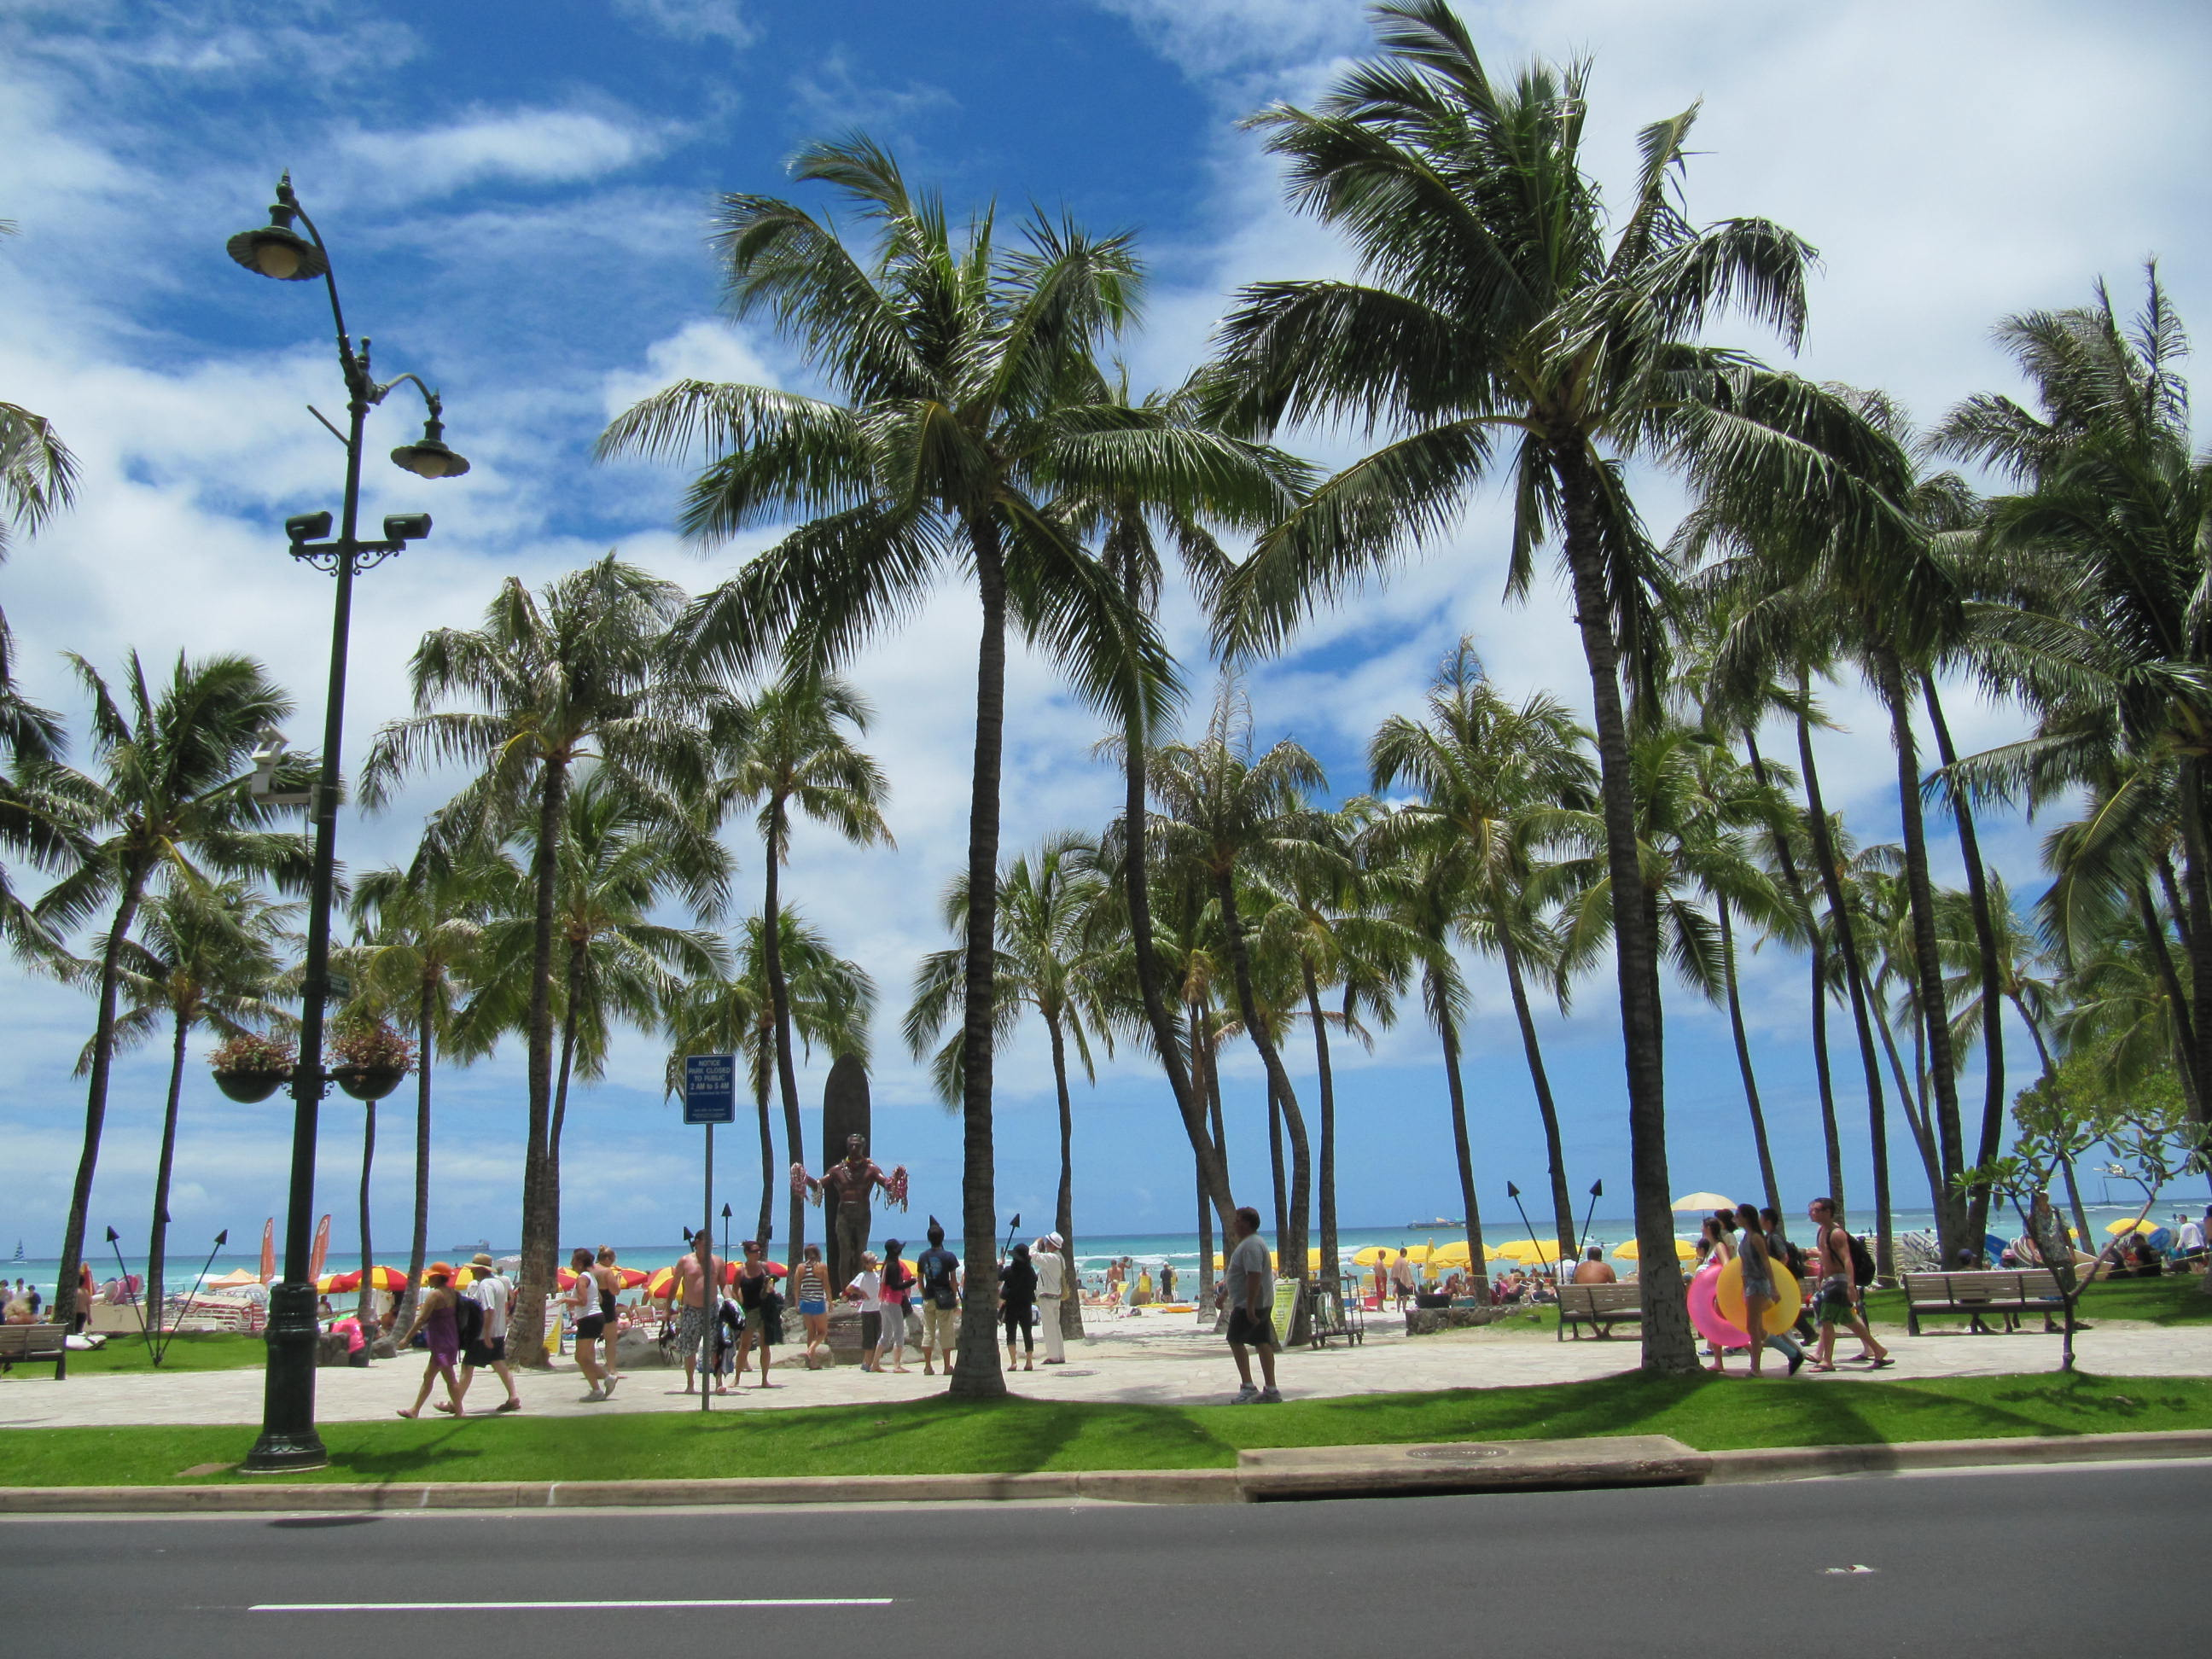 Waikiki Beach Wallpaper Hd: Waikiki Desktop Wallpaper